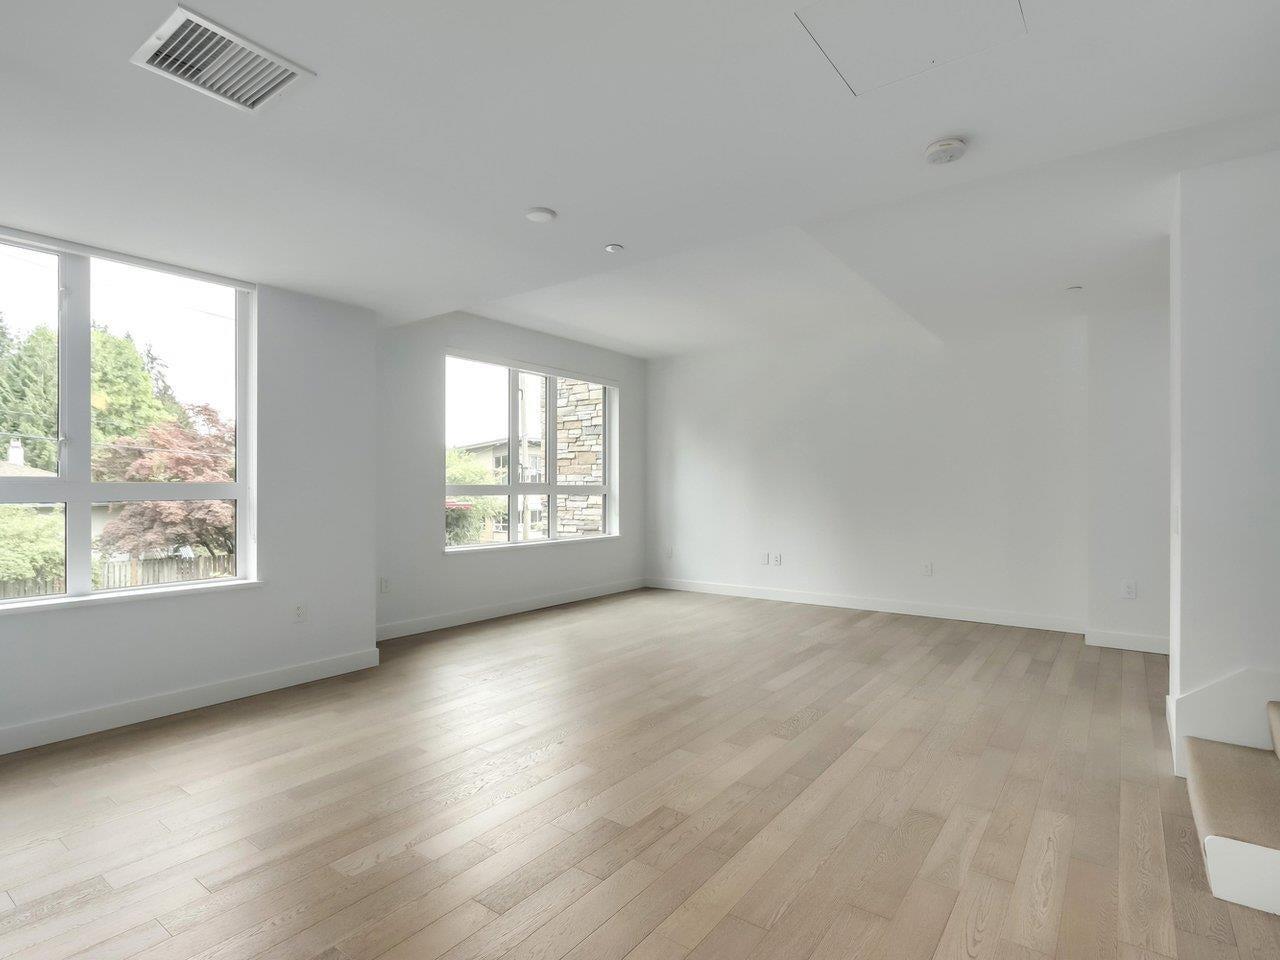 202 1055 RIDGEWOOD DRIVE - Edgemont Townhouse for sale, 3 Bedrooms (R2611487) - #6